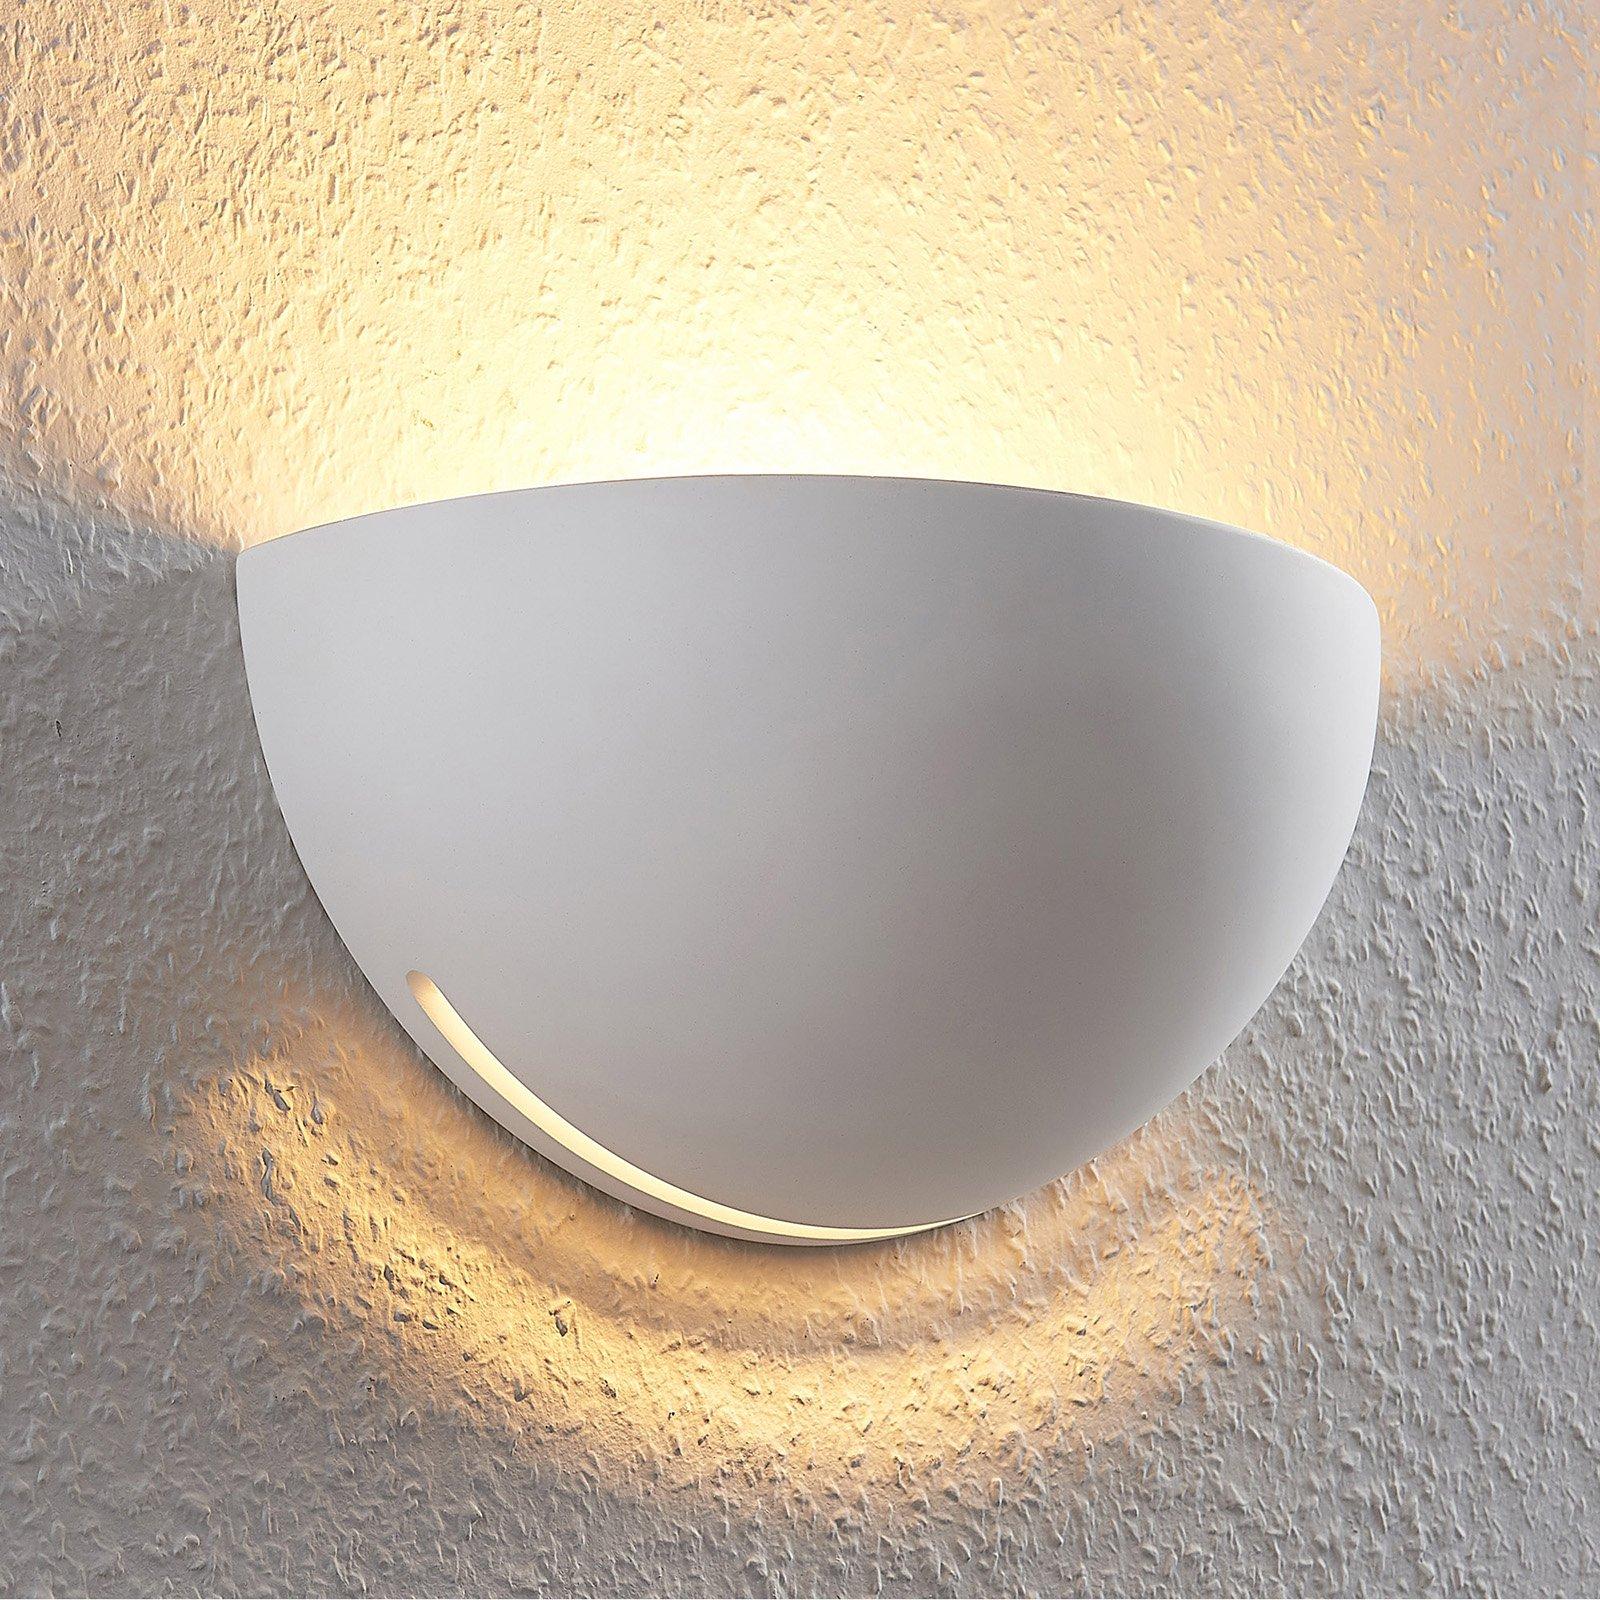 Vegglampe uplight i gips Jaron, hvit, halvrund